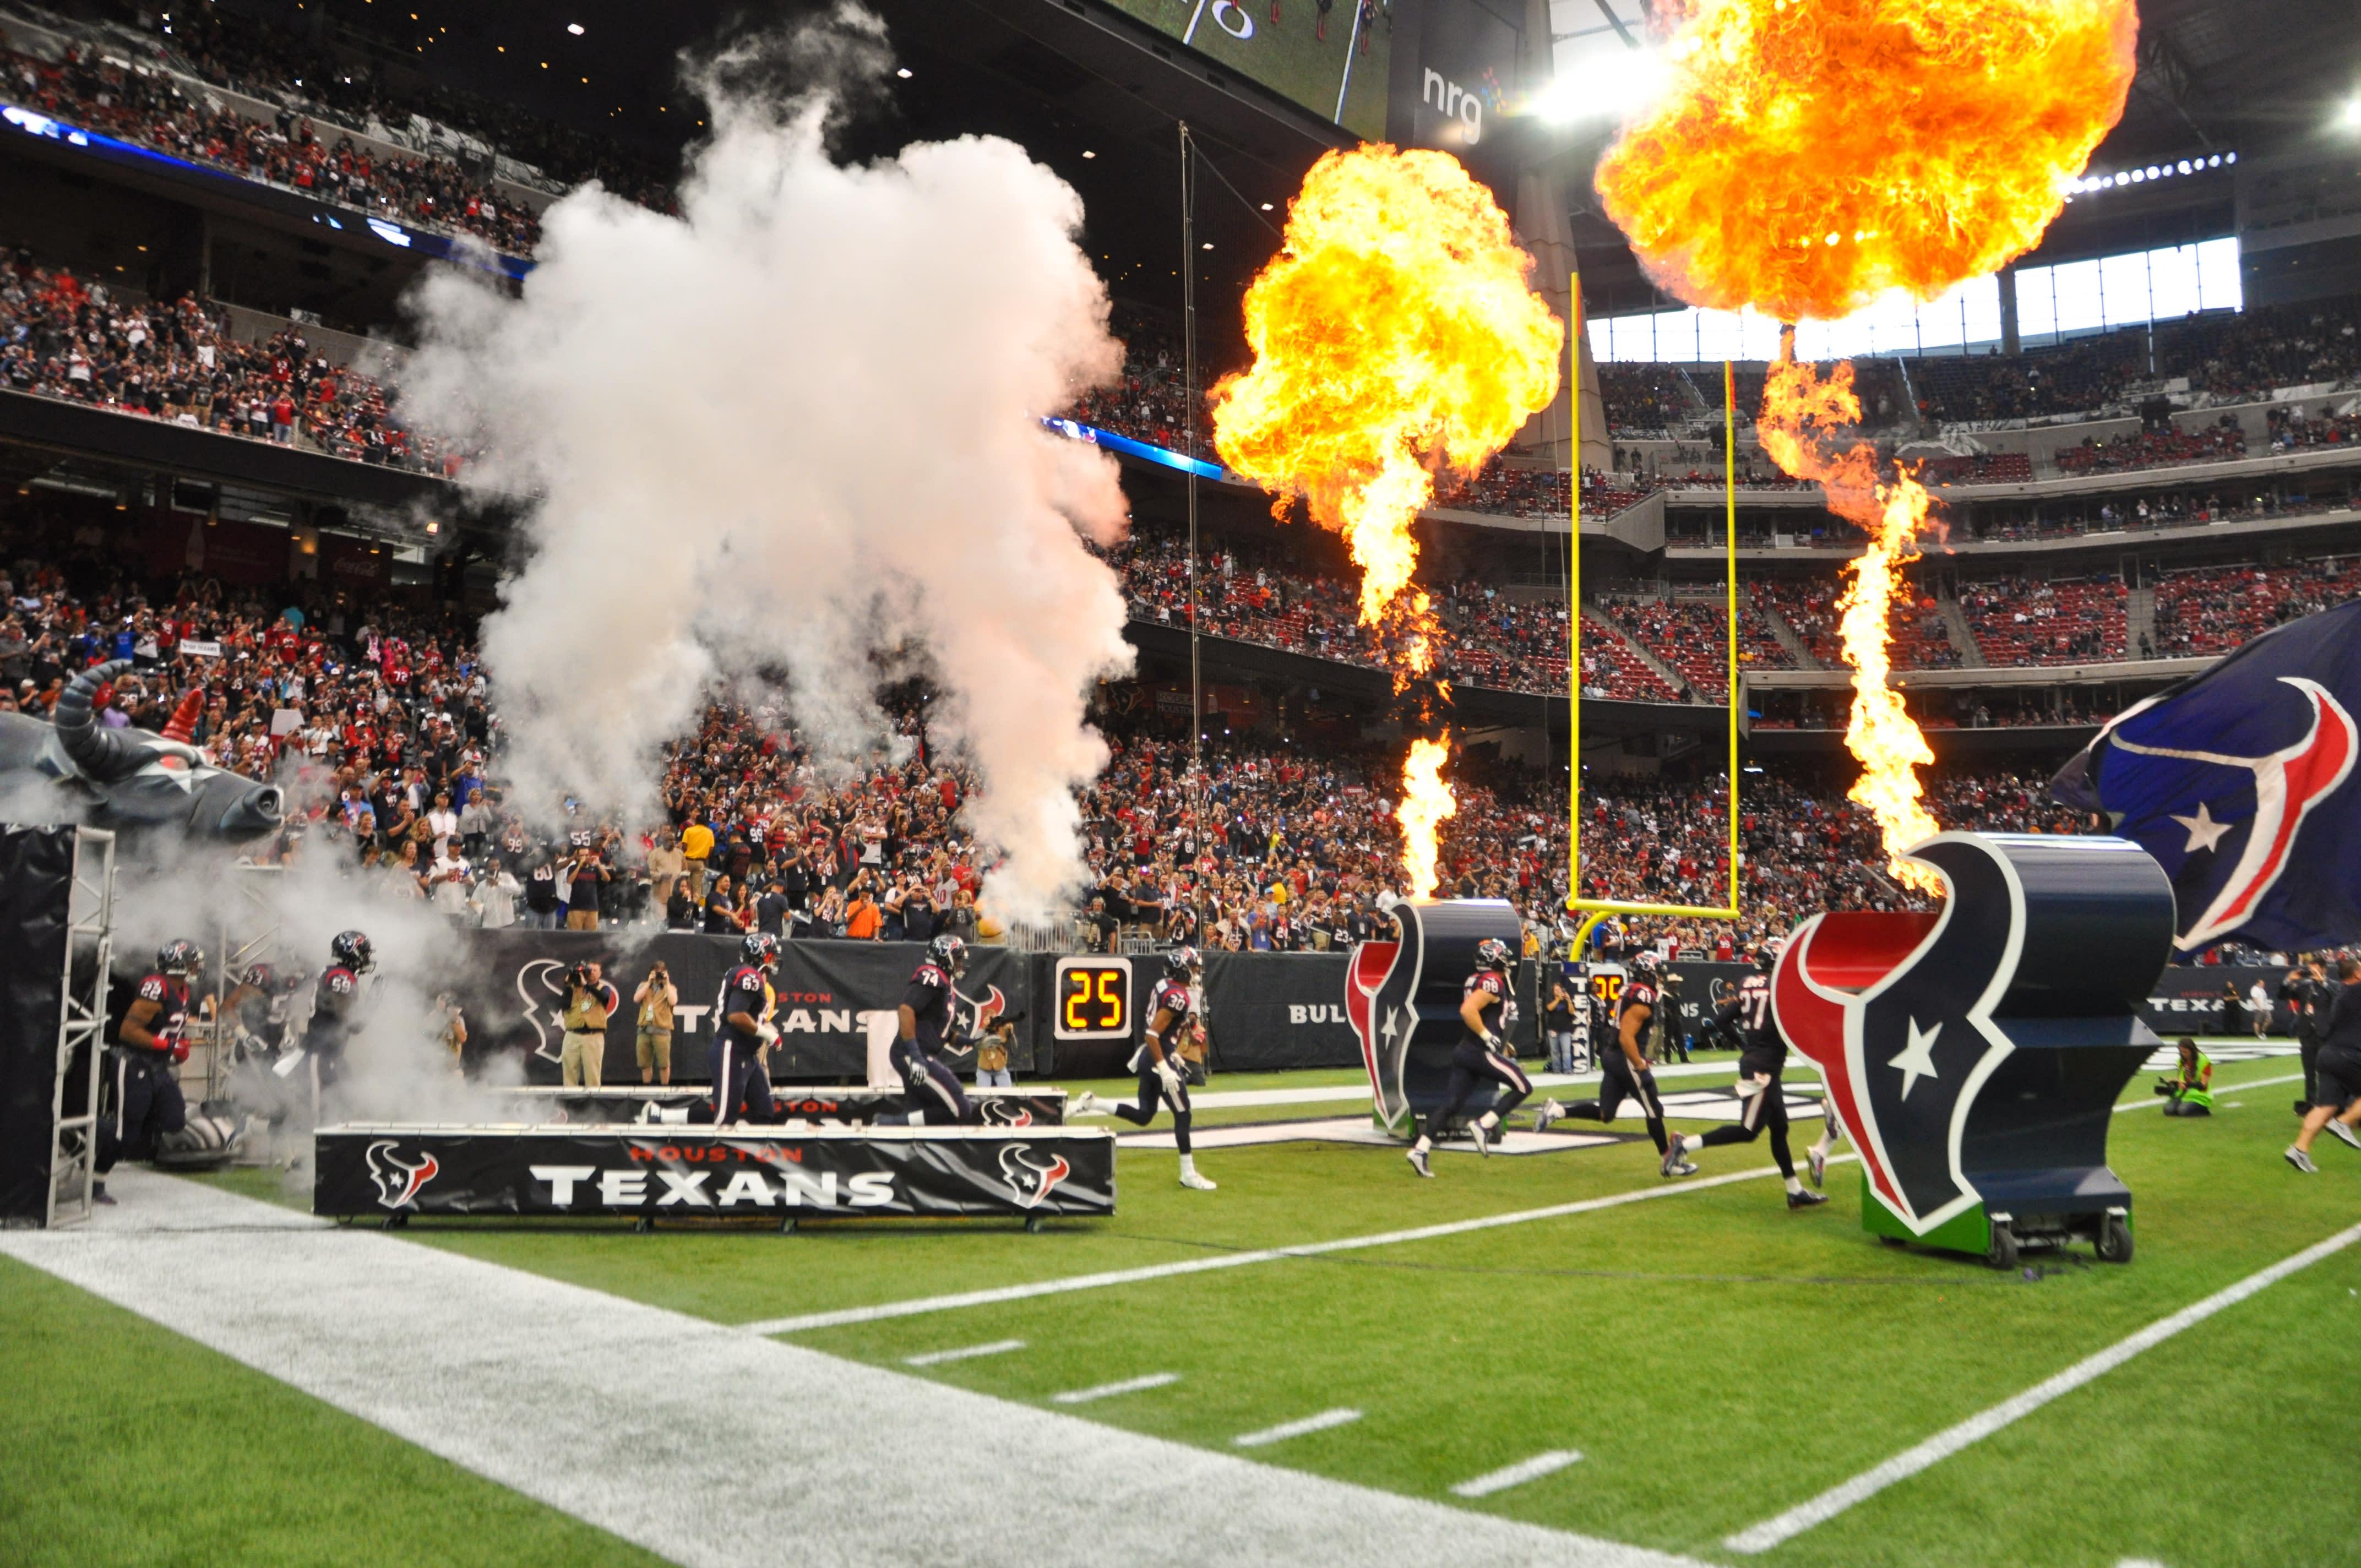 Houston Texans Coming Onto Field